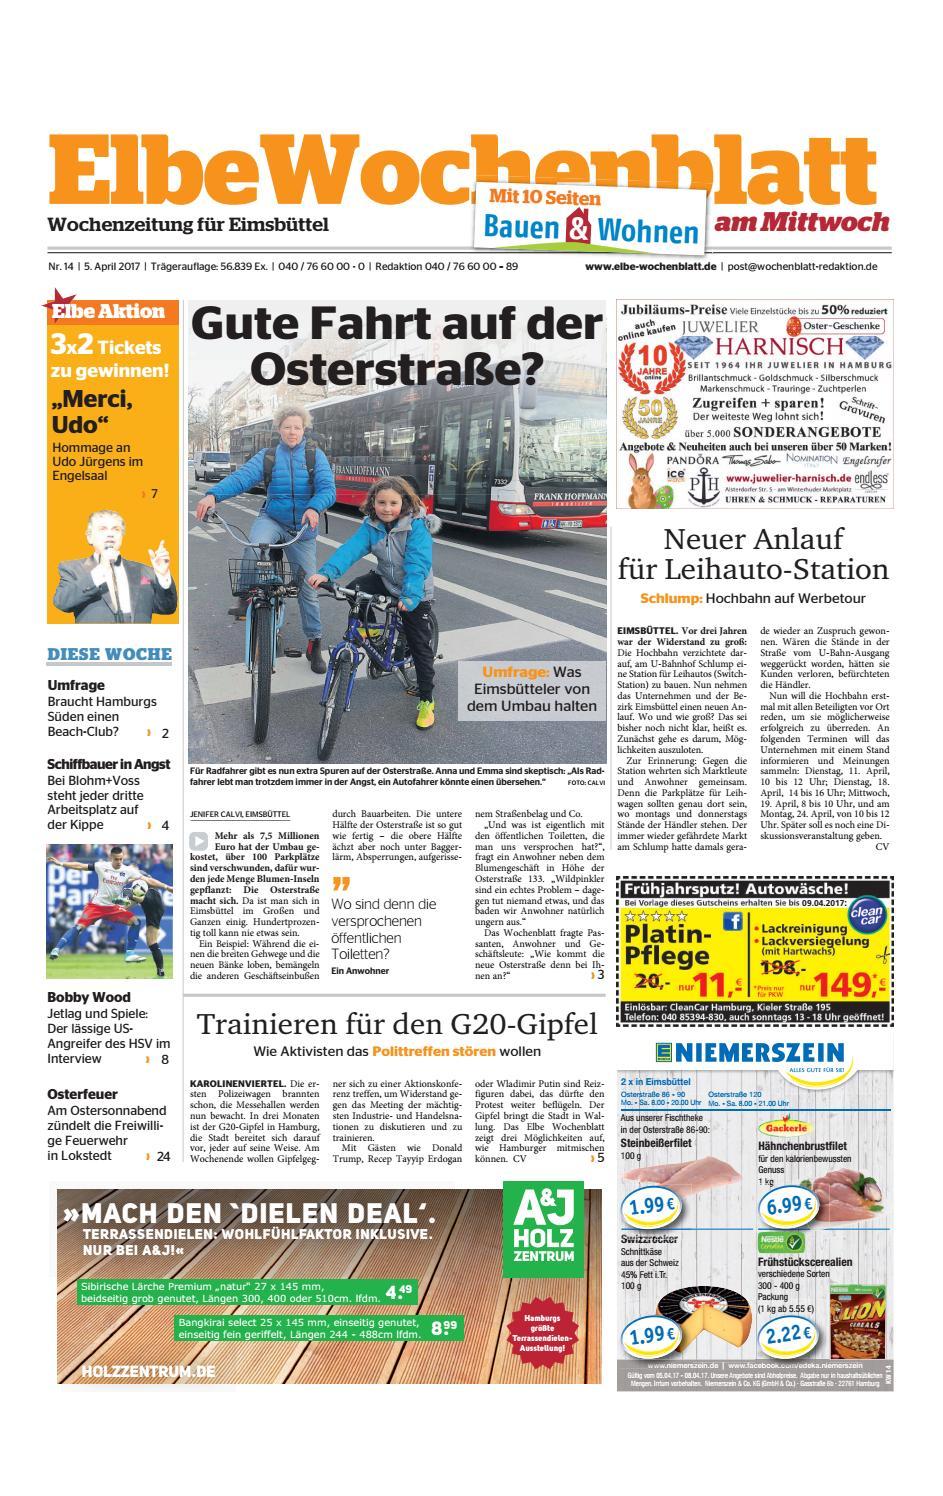 Eimsbüttel KW14 2017 by Elbe Wochenblatt Verlagsgesellschaft